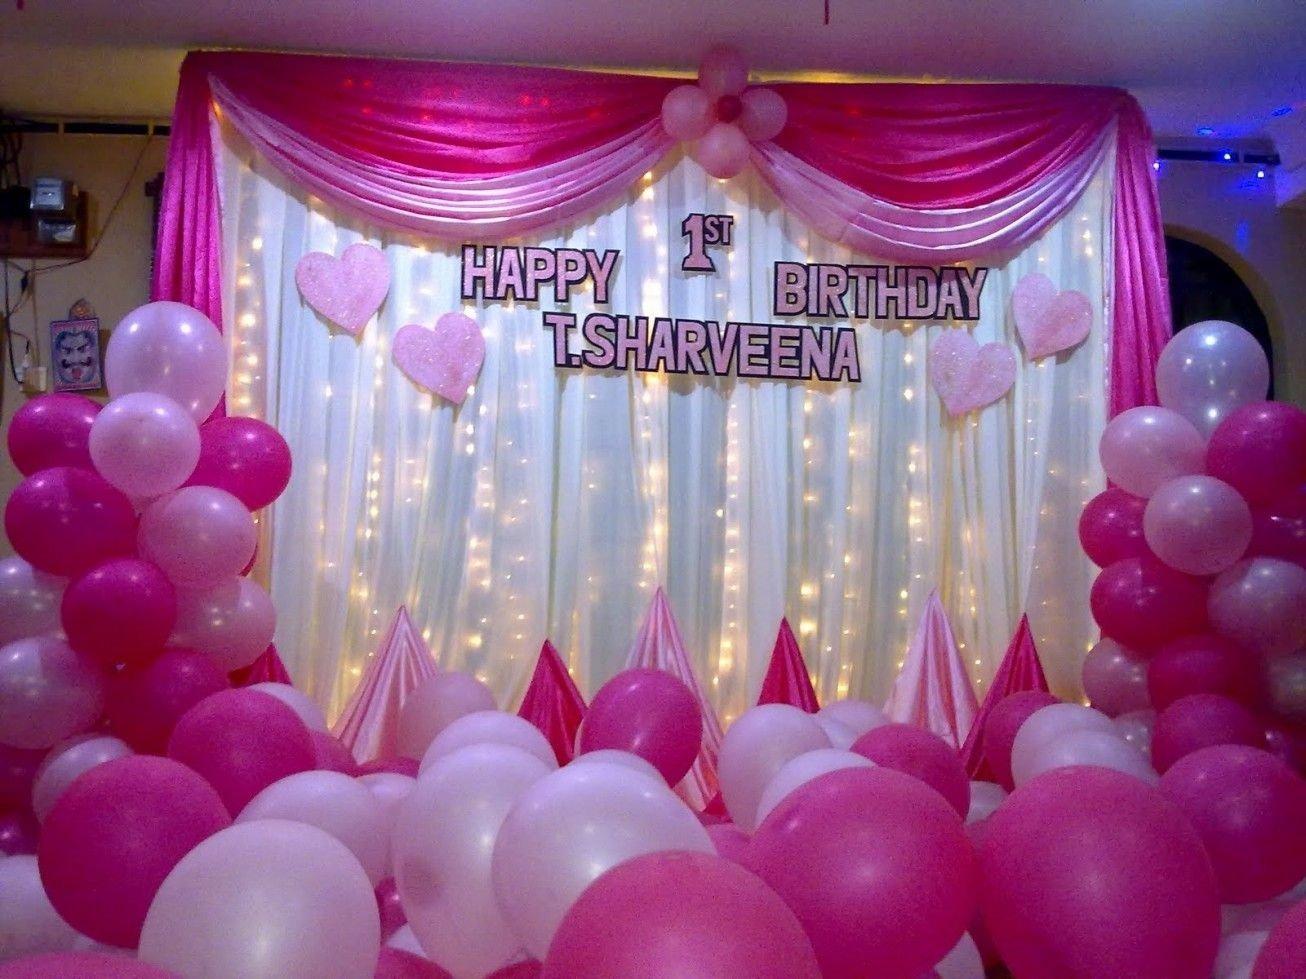 10 Stylish 1St Birthday Party Decoration Ideas 1st birthday party decoration party decorations pinterest